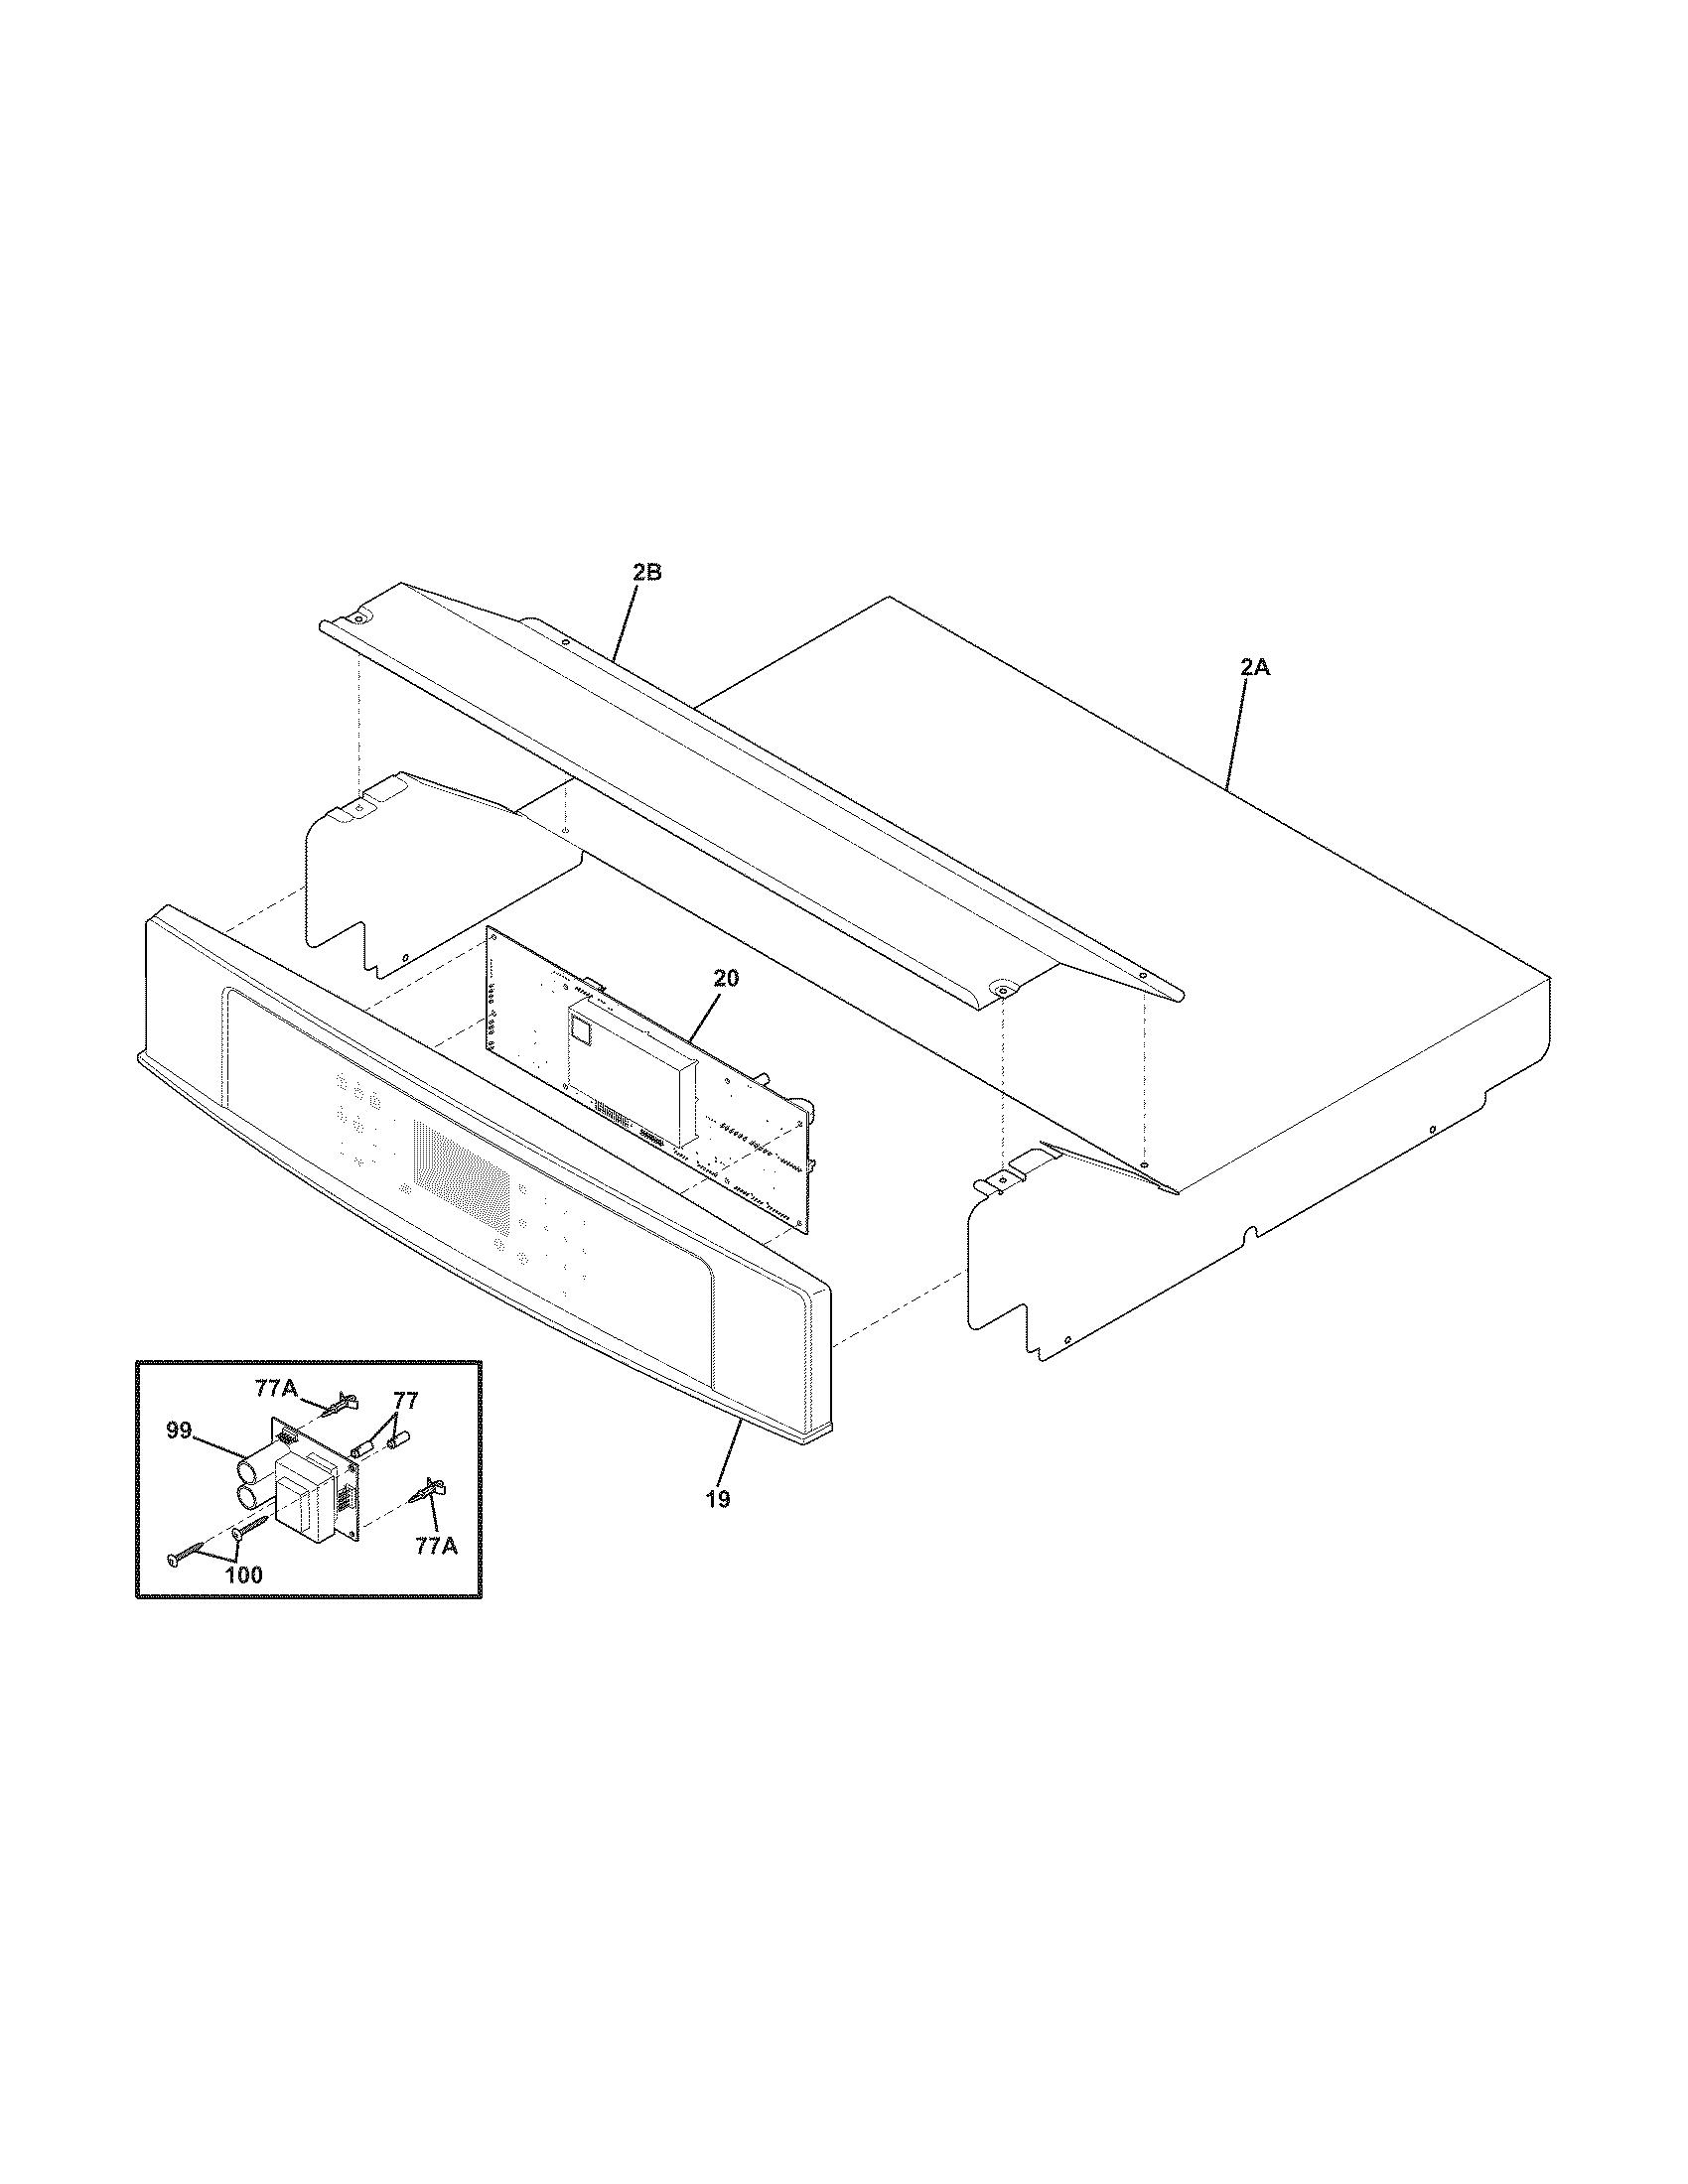 https://edu-apps herokuapp com/post/wiring-diagram-electrolux